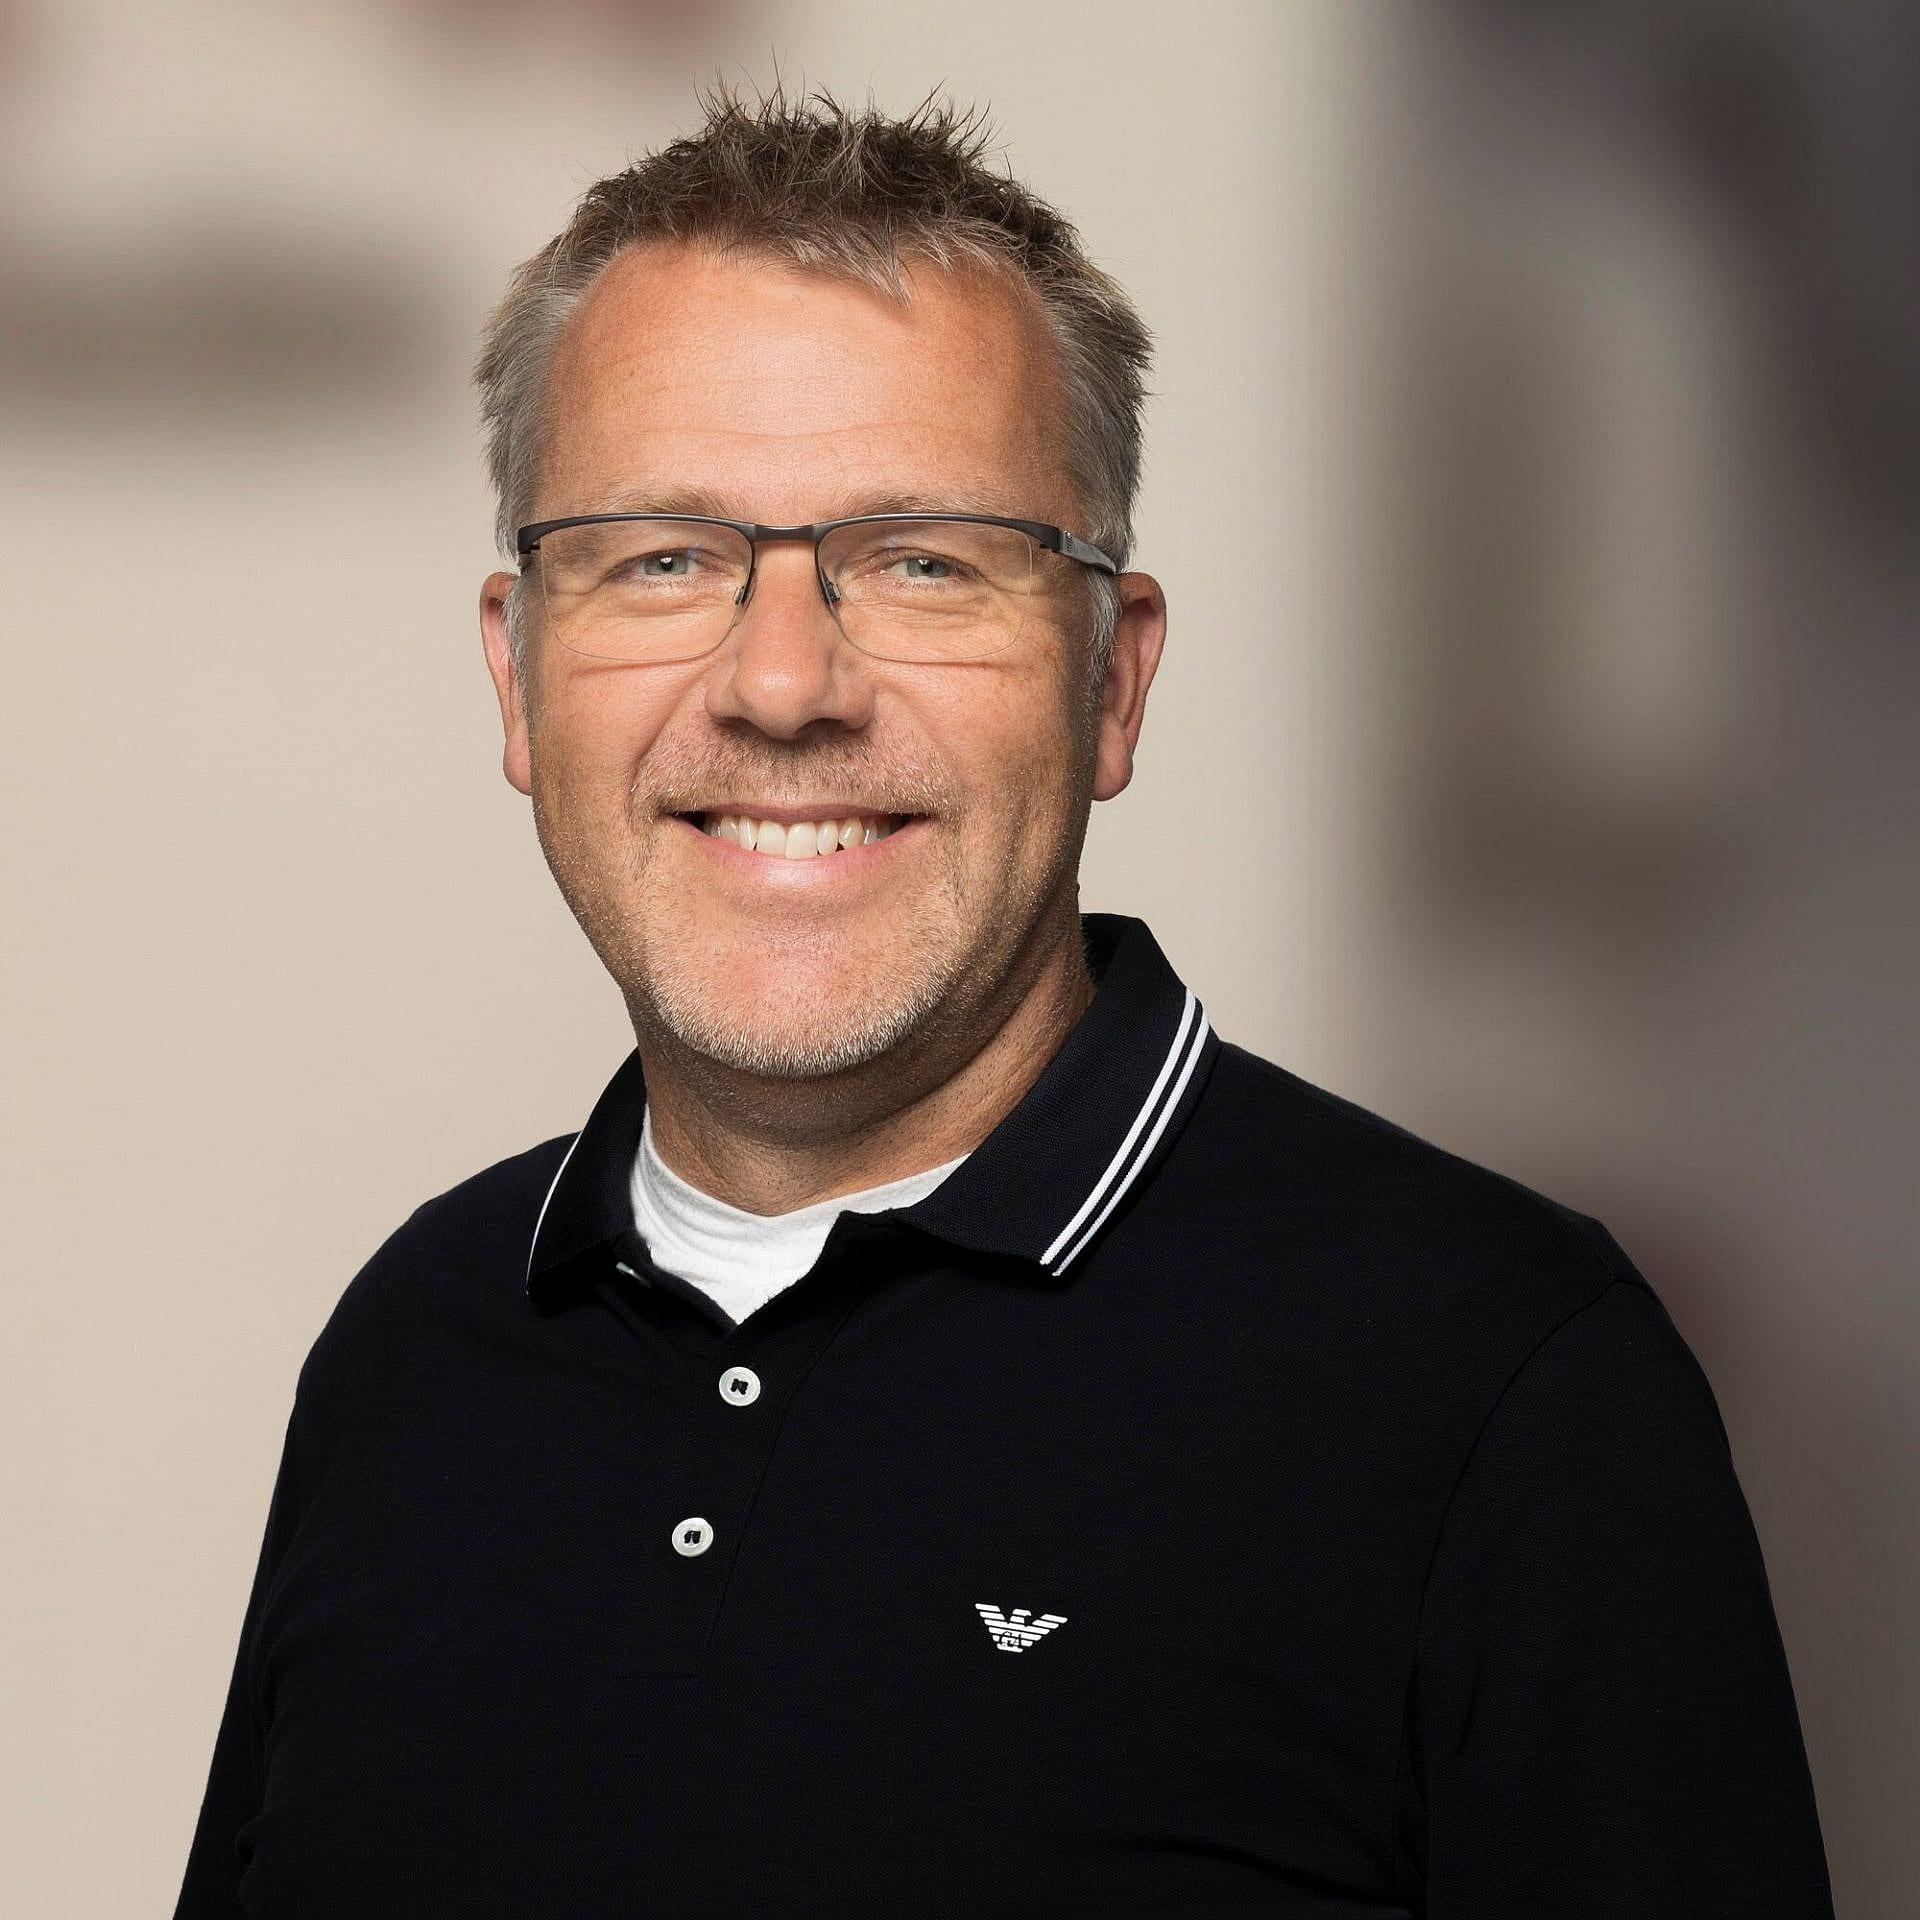 Jesper Elimar Petersen